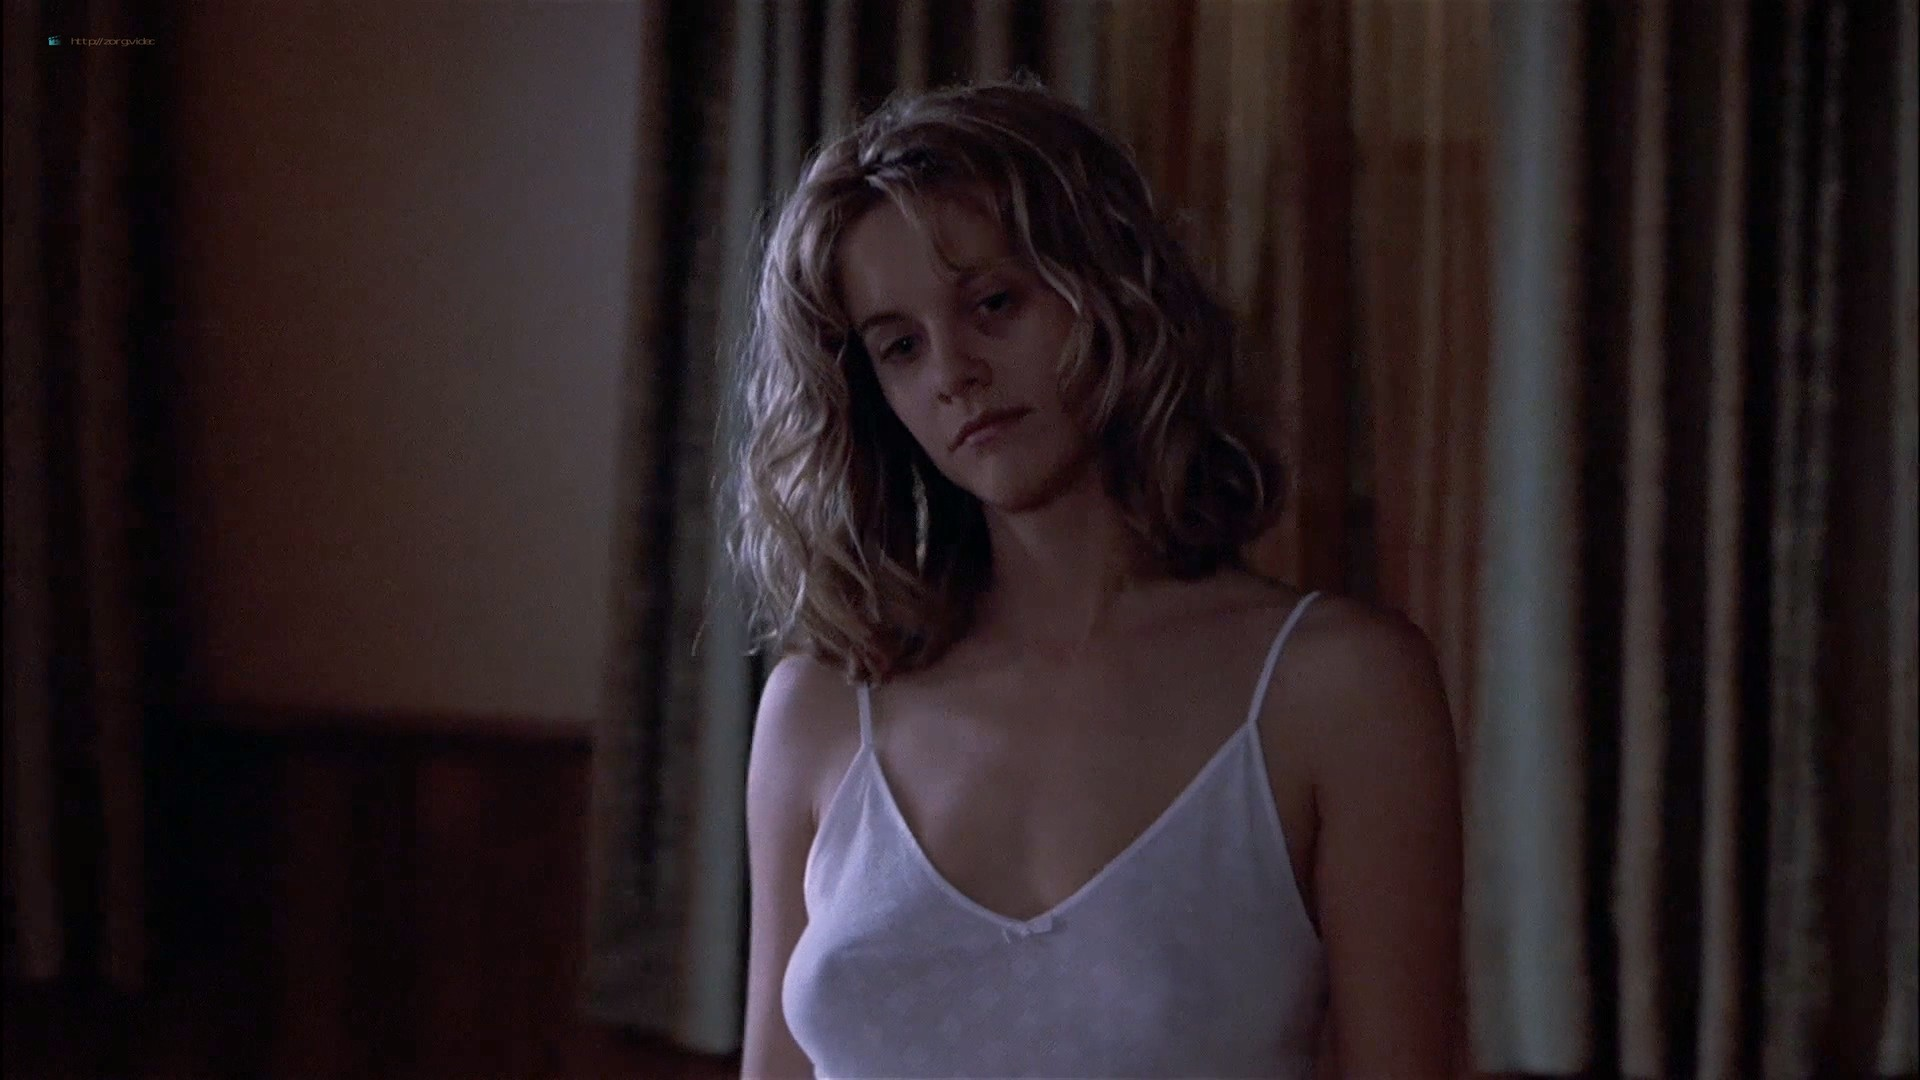 Gwyneth Paltrow nude Meg Ryan and Barbara Alyn Woods nude too - Flesh and Bone (1993) HDTV 1080p (10)